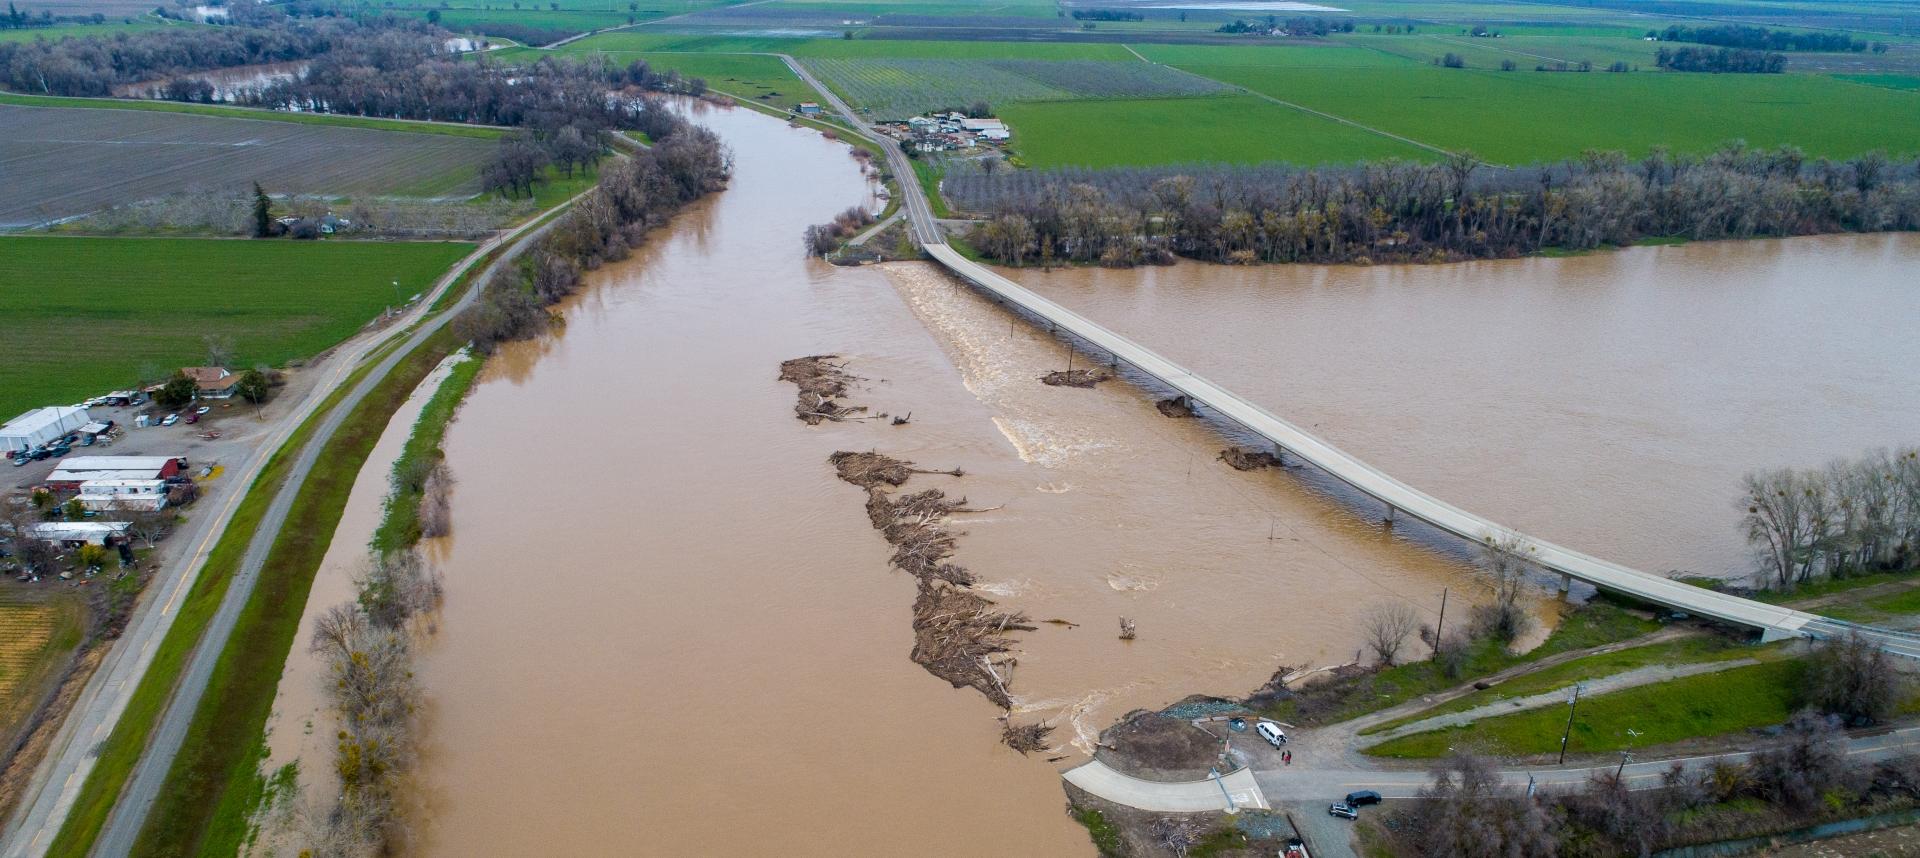 Sacramento River flooded into farmlands and highway